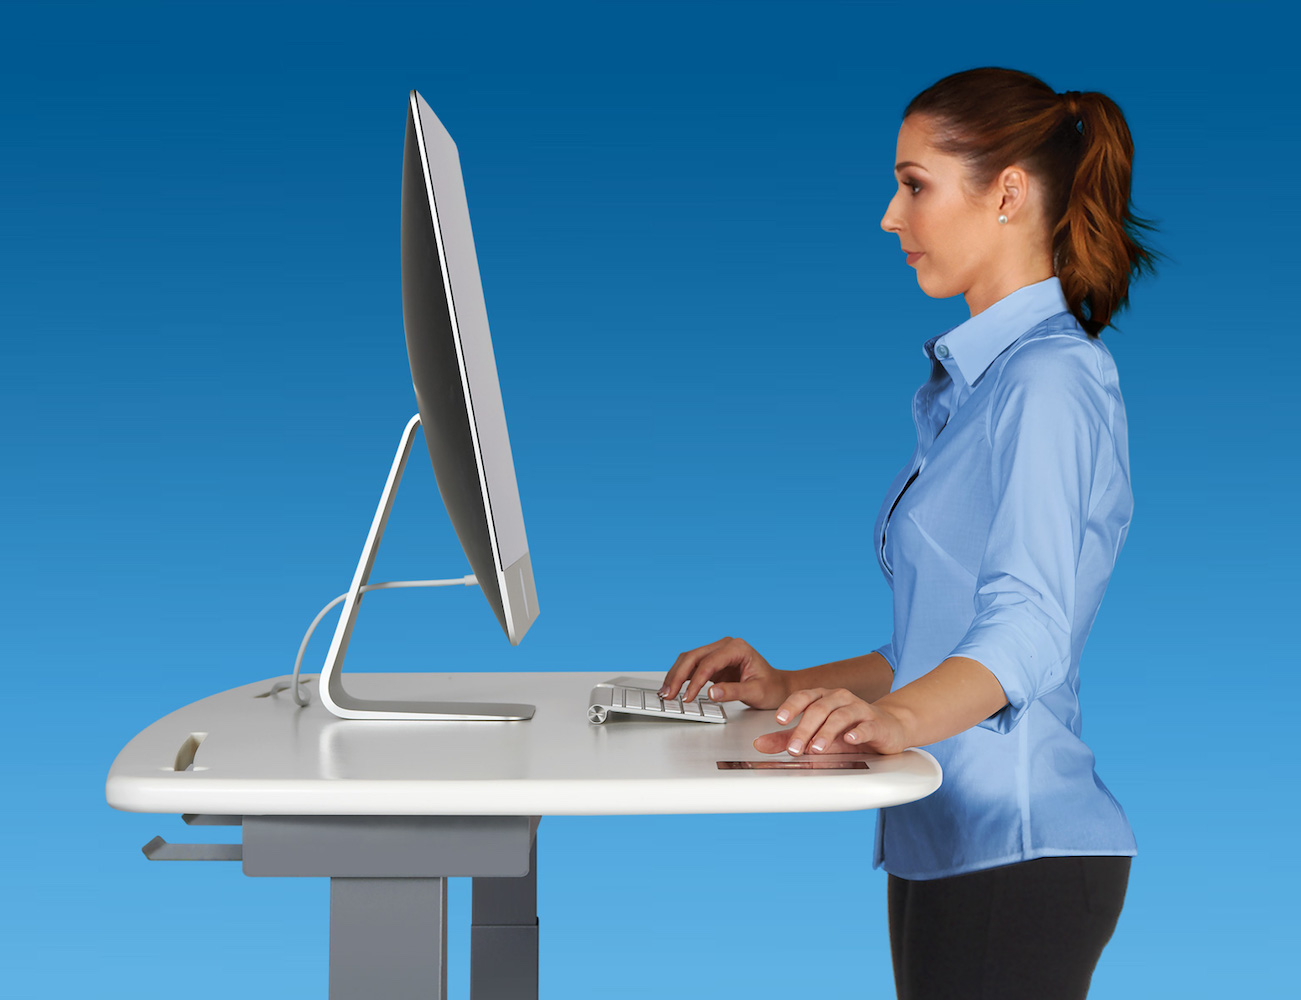 Stir Kinetic Desk – The Desk That Drives Results